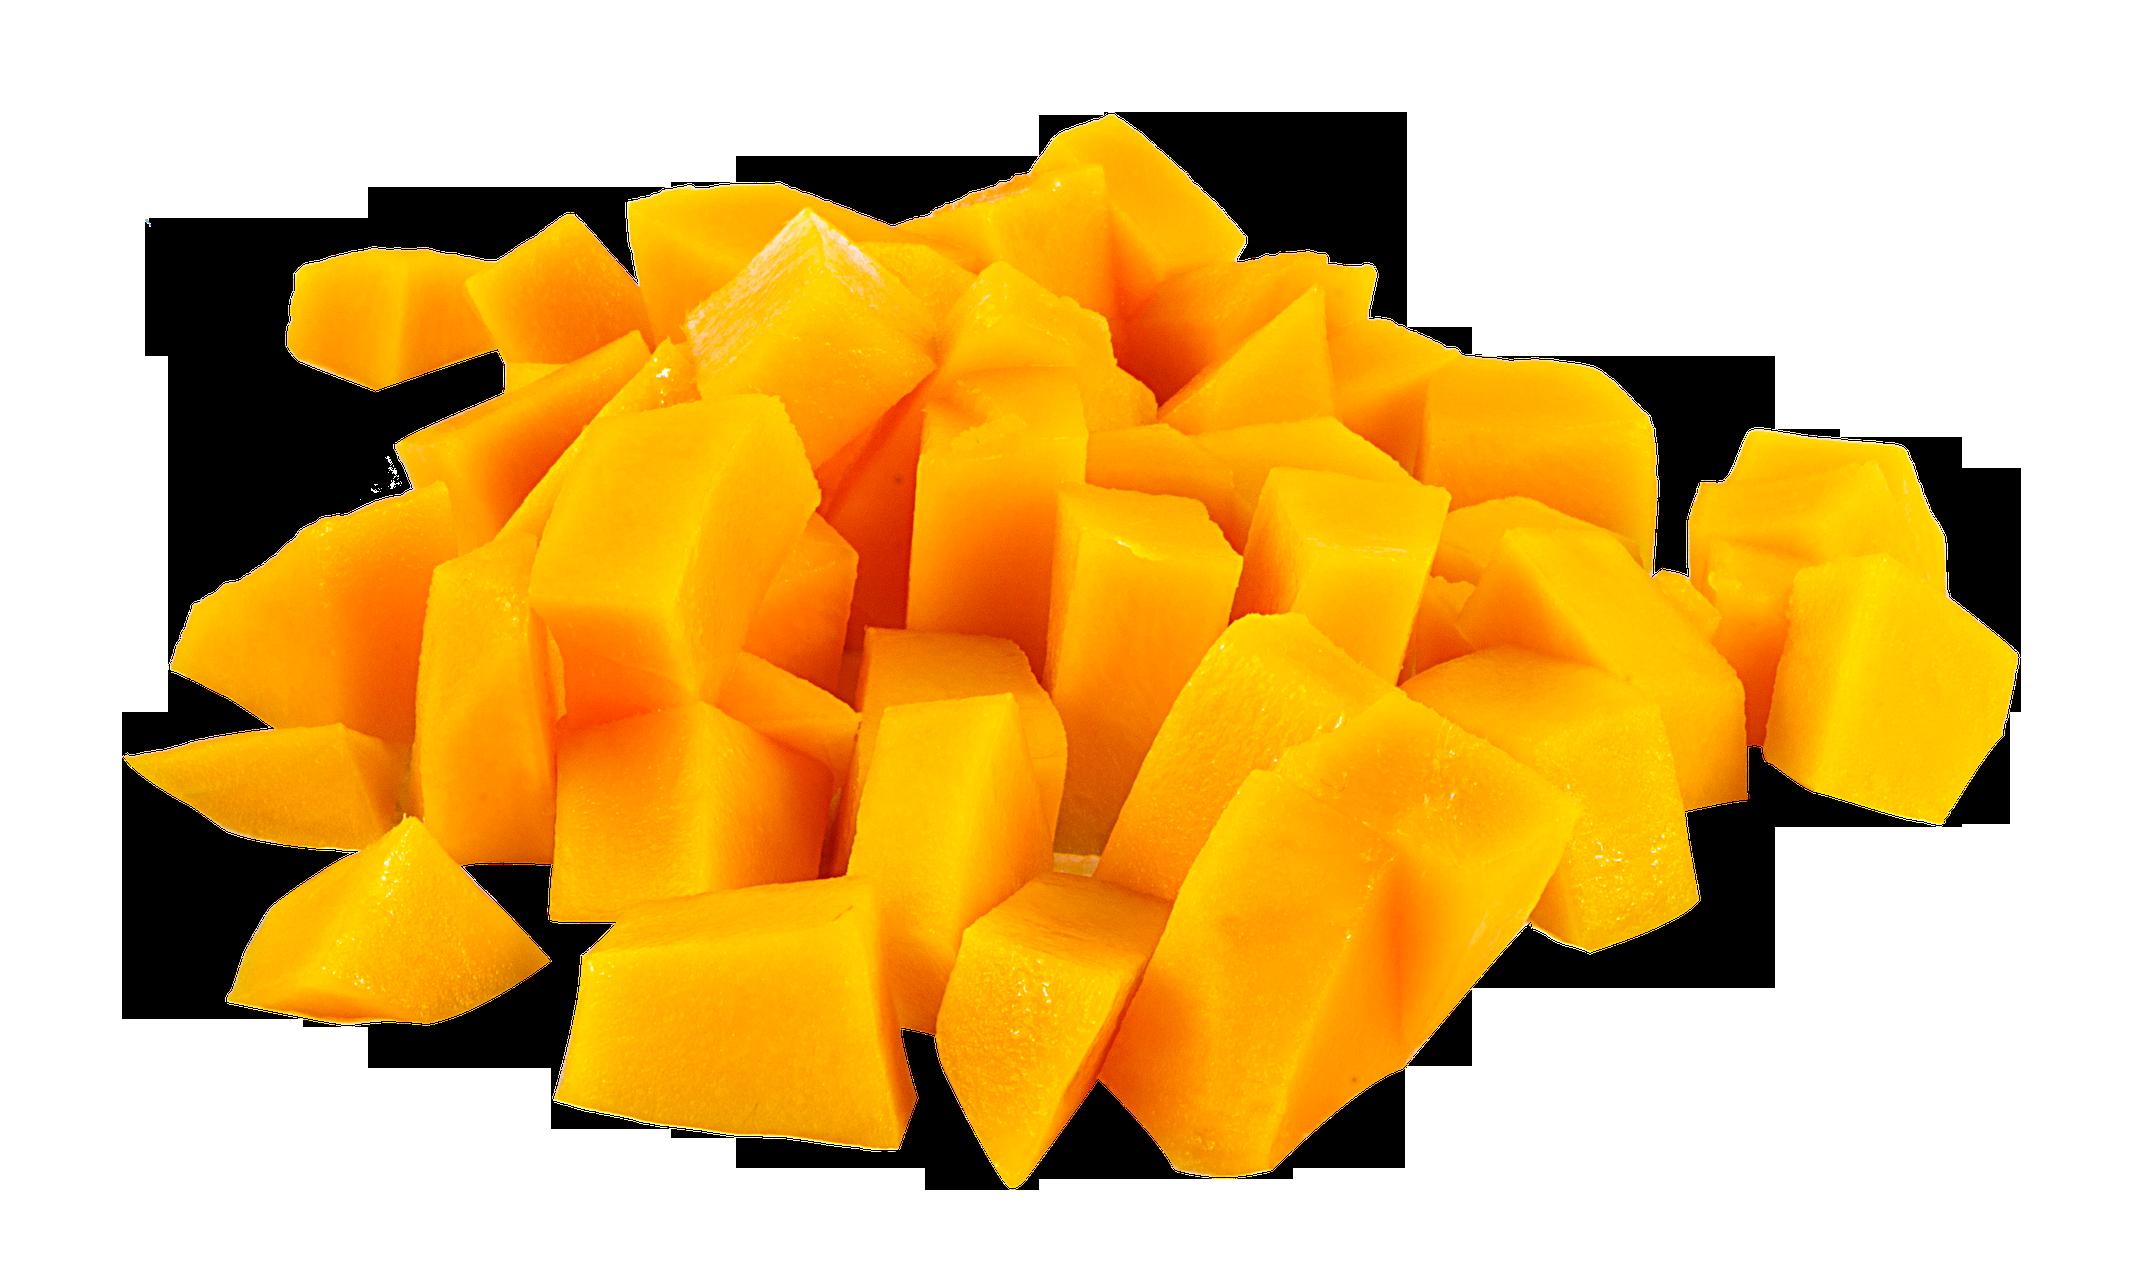 clipart stock Mango Slice PNG Image